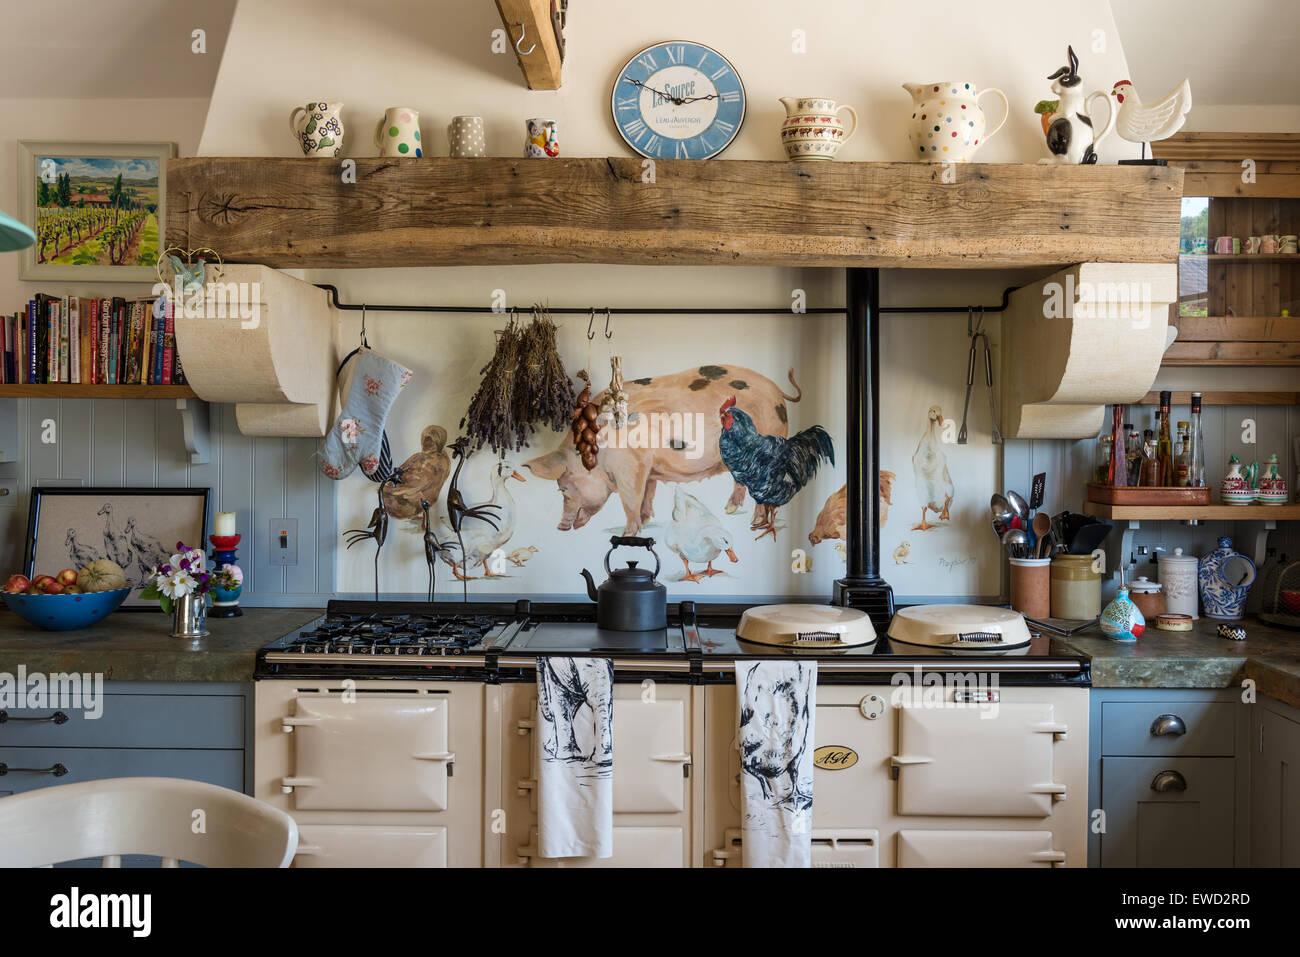 Painted Pig Stockfotos & Painted Pig Bilder - Alamy